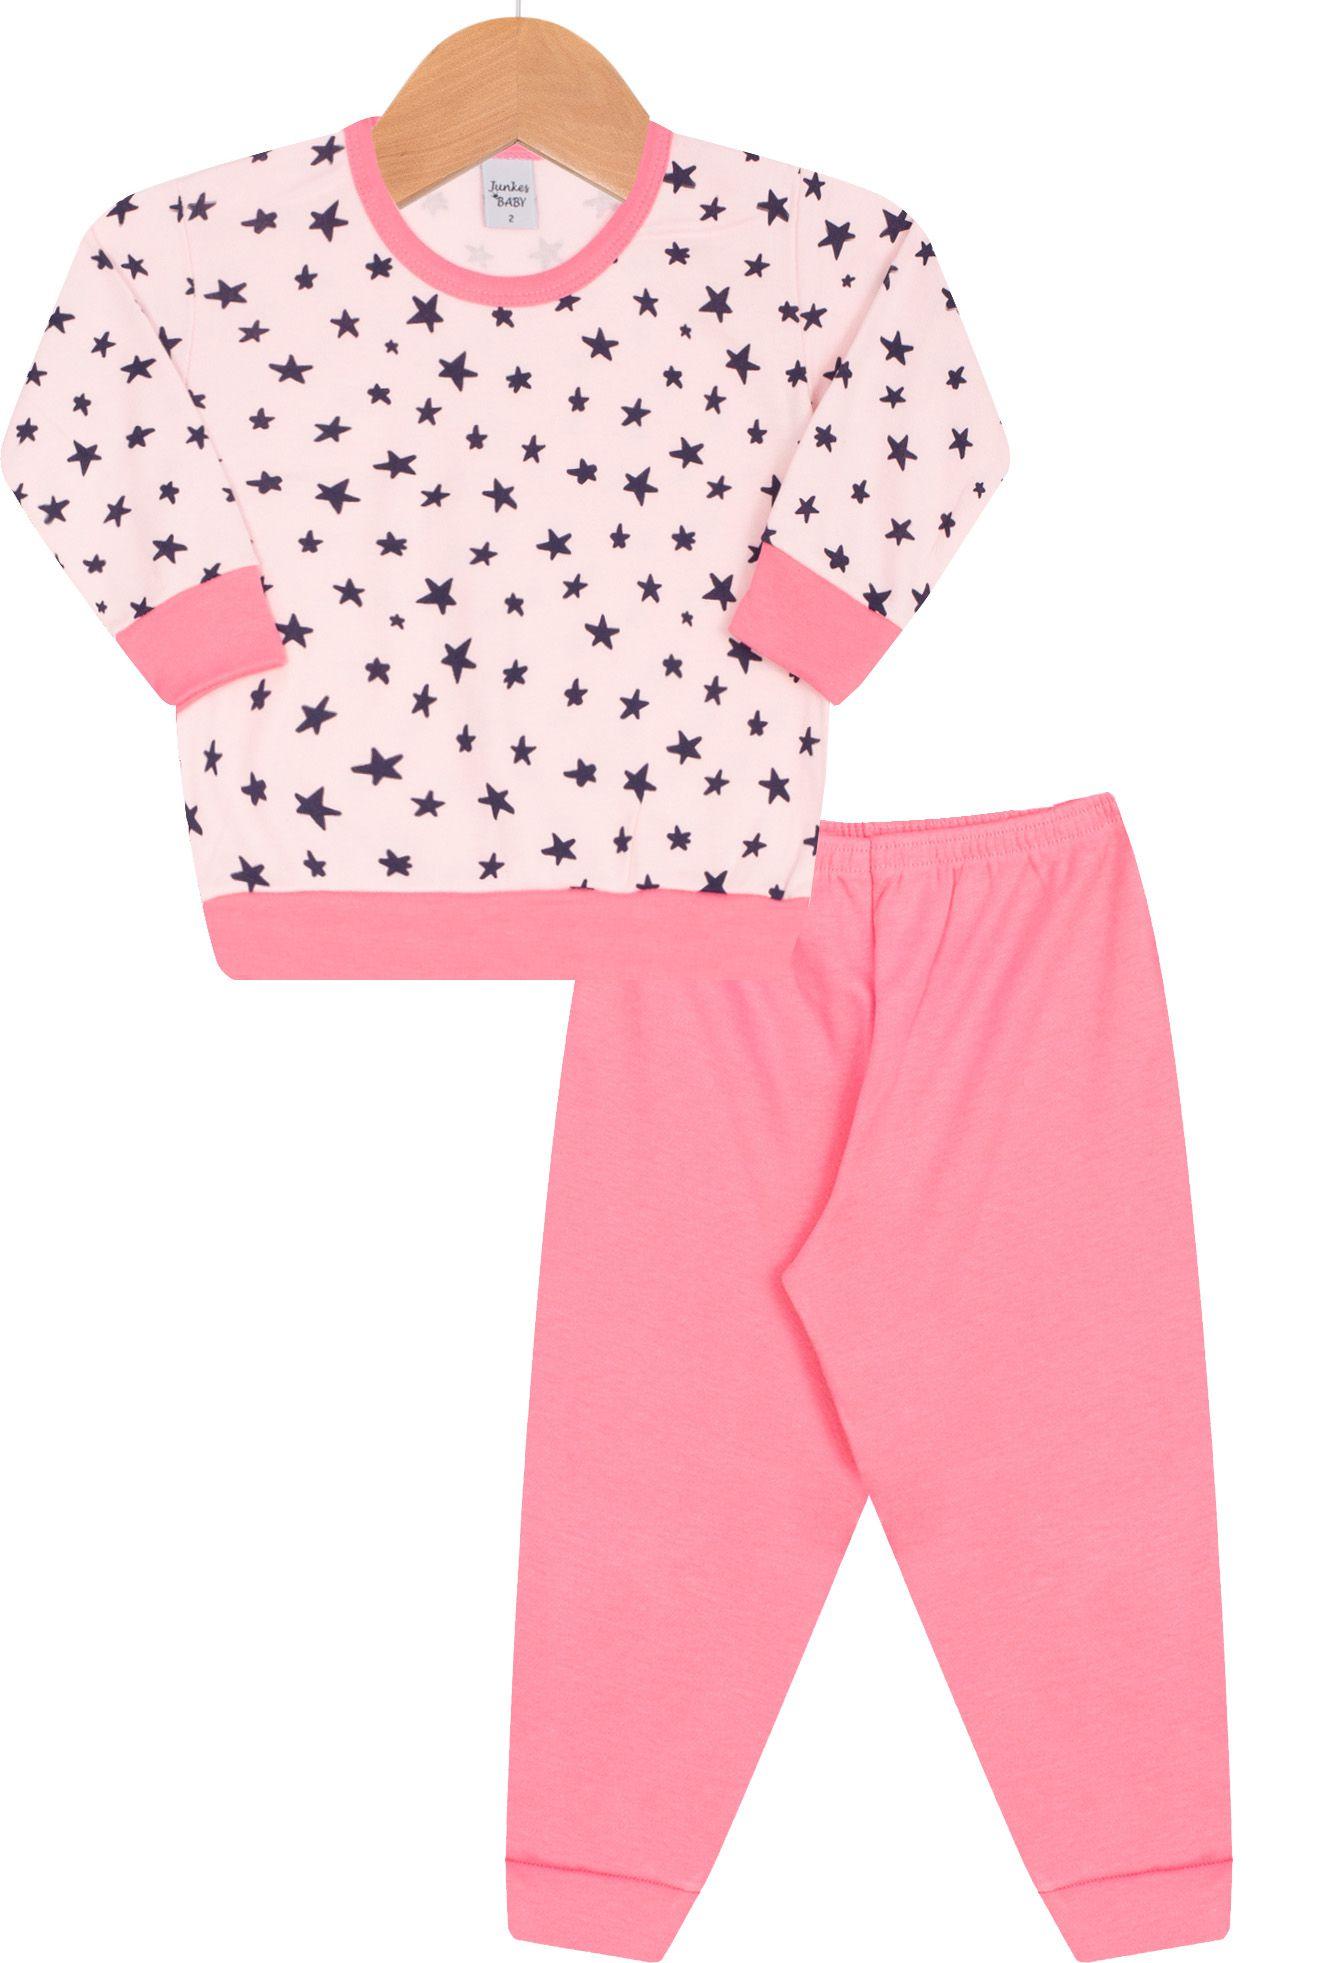 Pijama Suedine Junkes Baby Estrelinhas